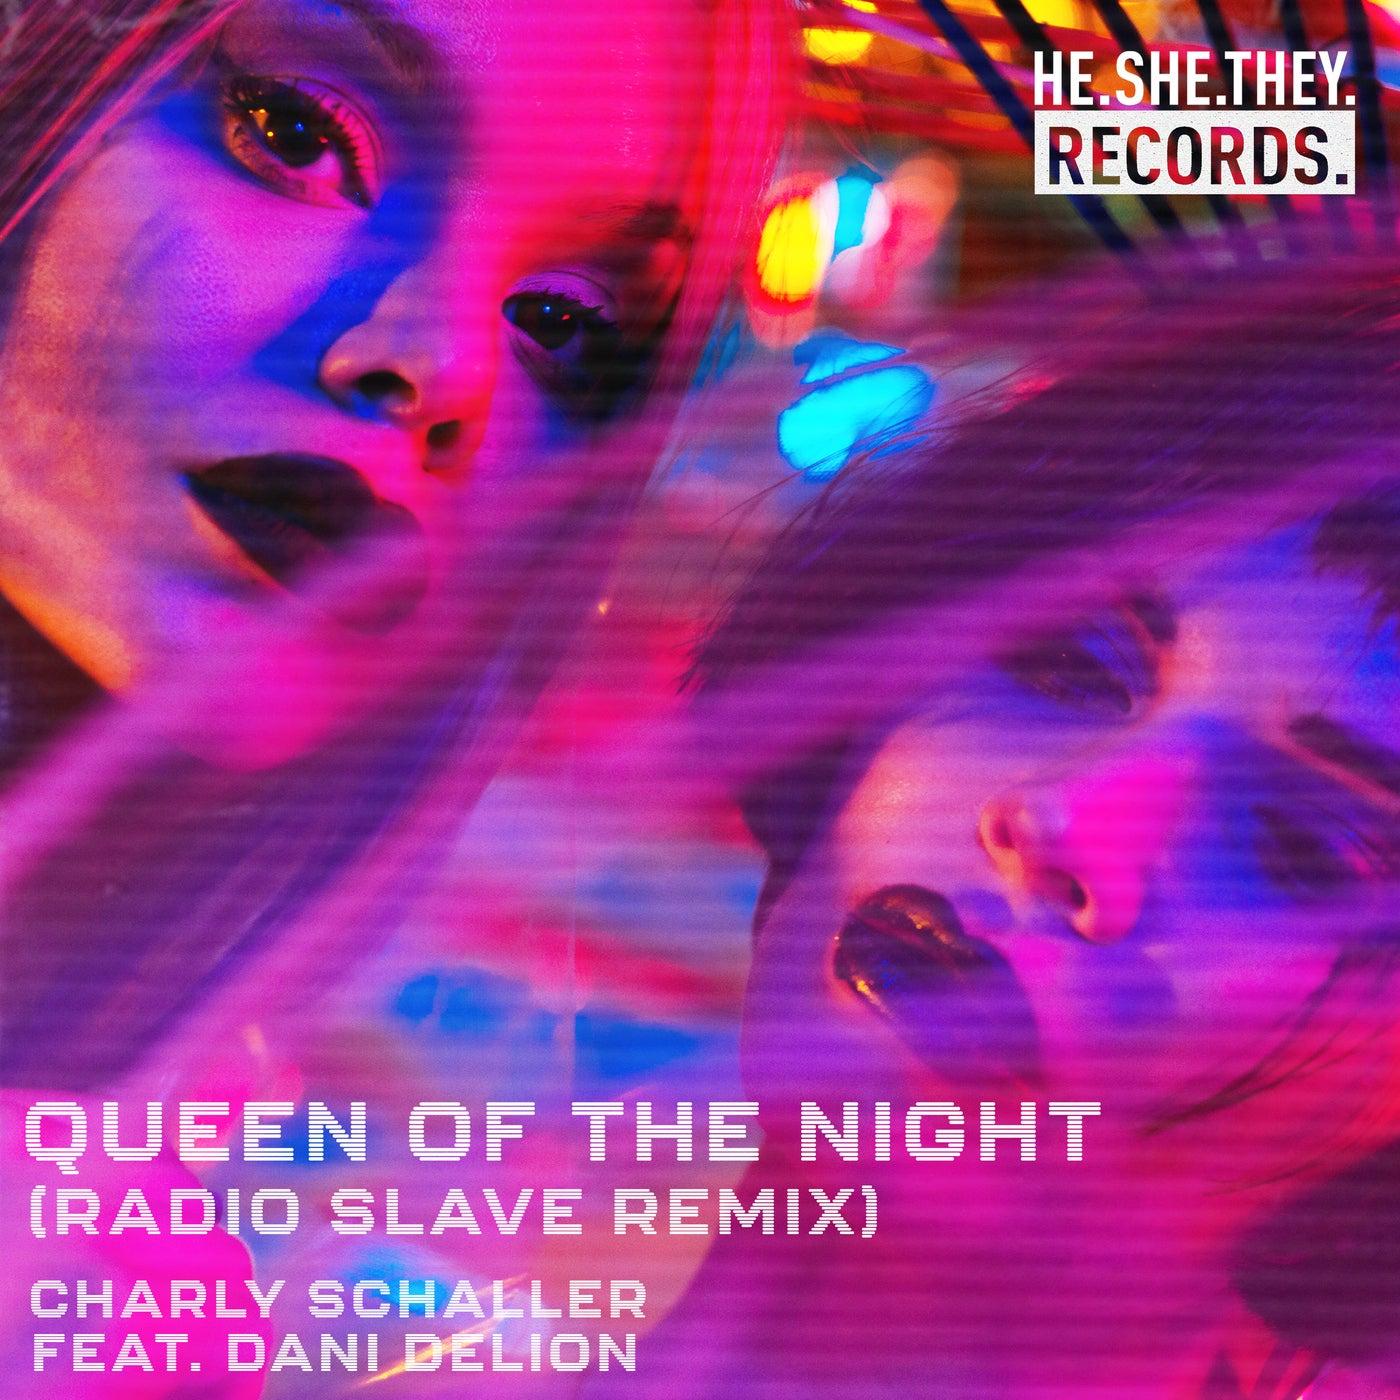 Queen Of The Night (feat. Dani DeLion) (Radio Slave Remix)